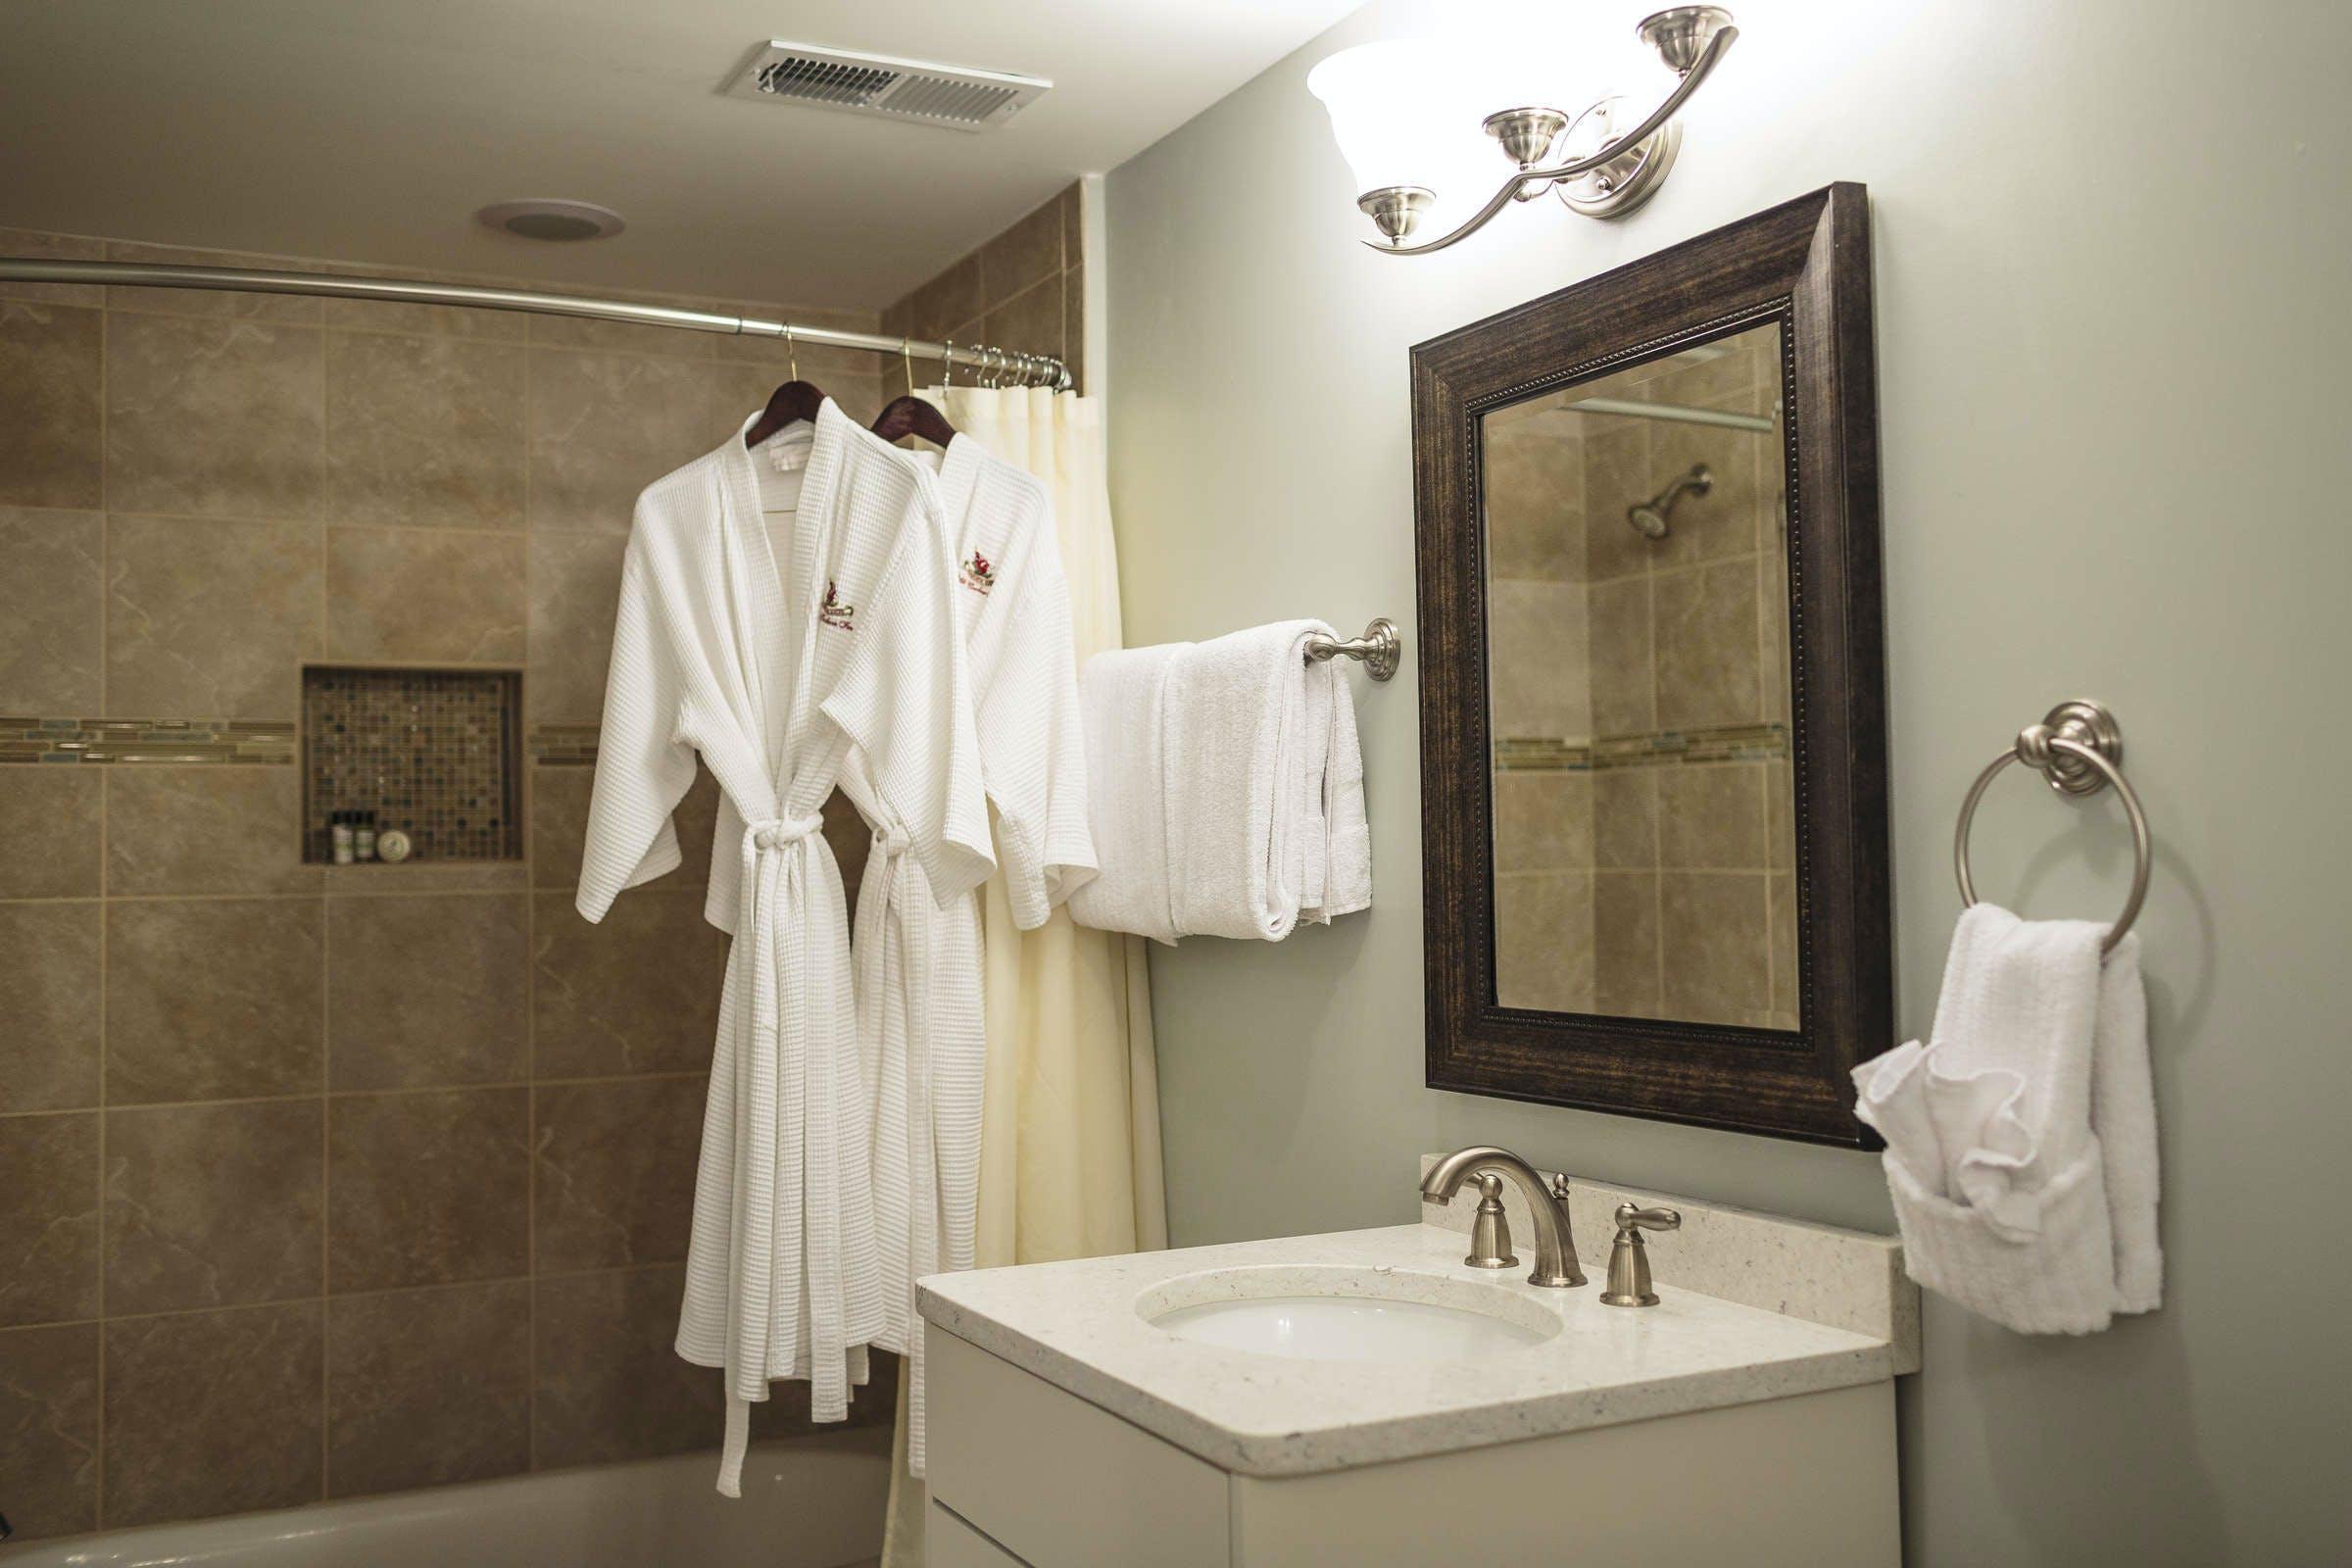 Olde Harbour Inn,Historic Inns of Savannah Collection